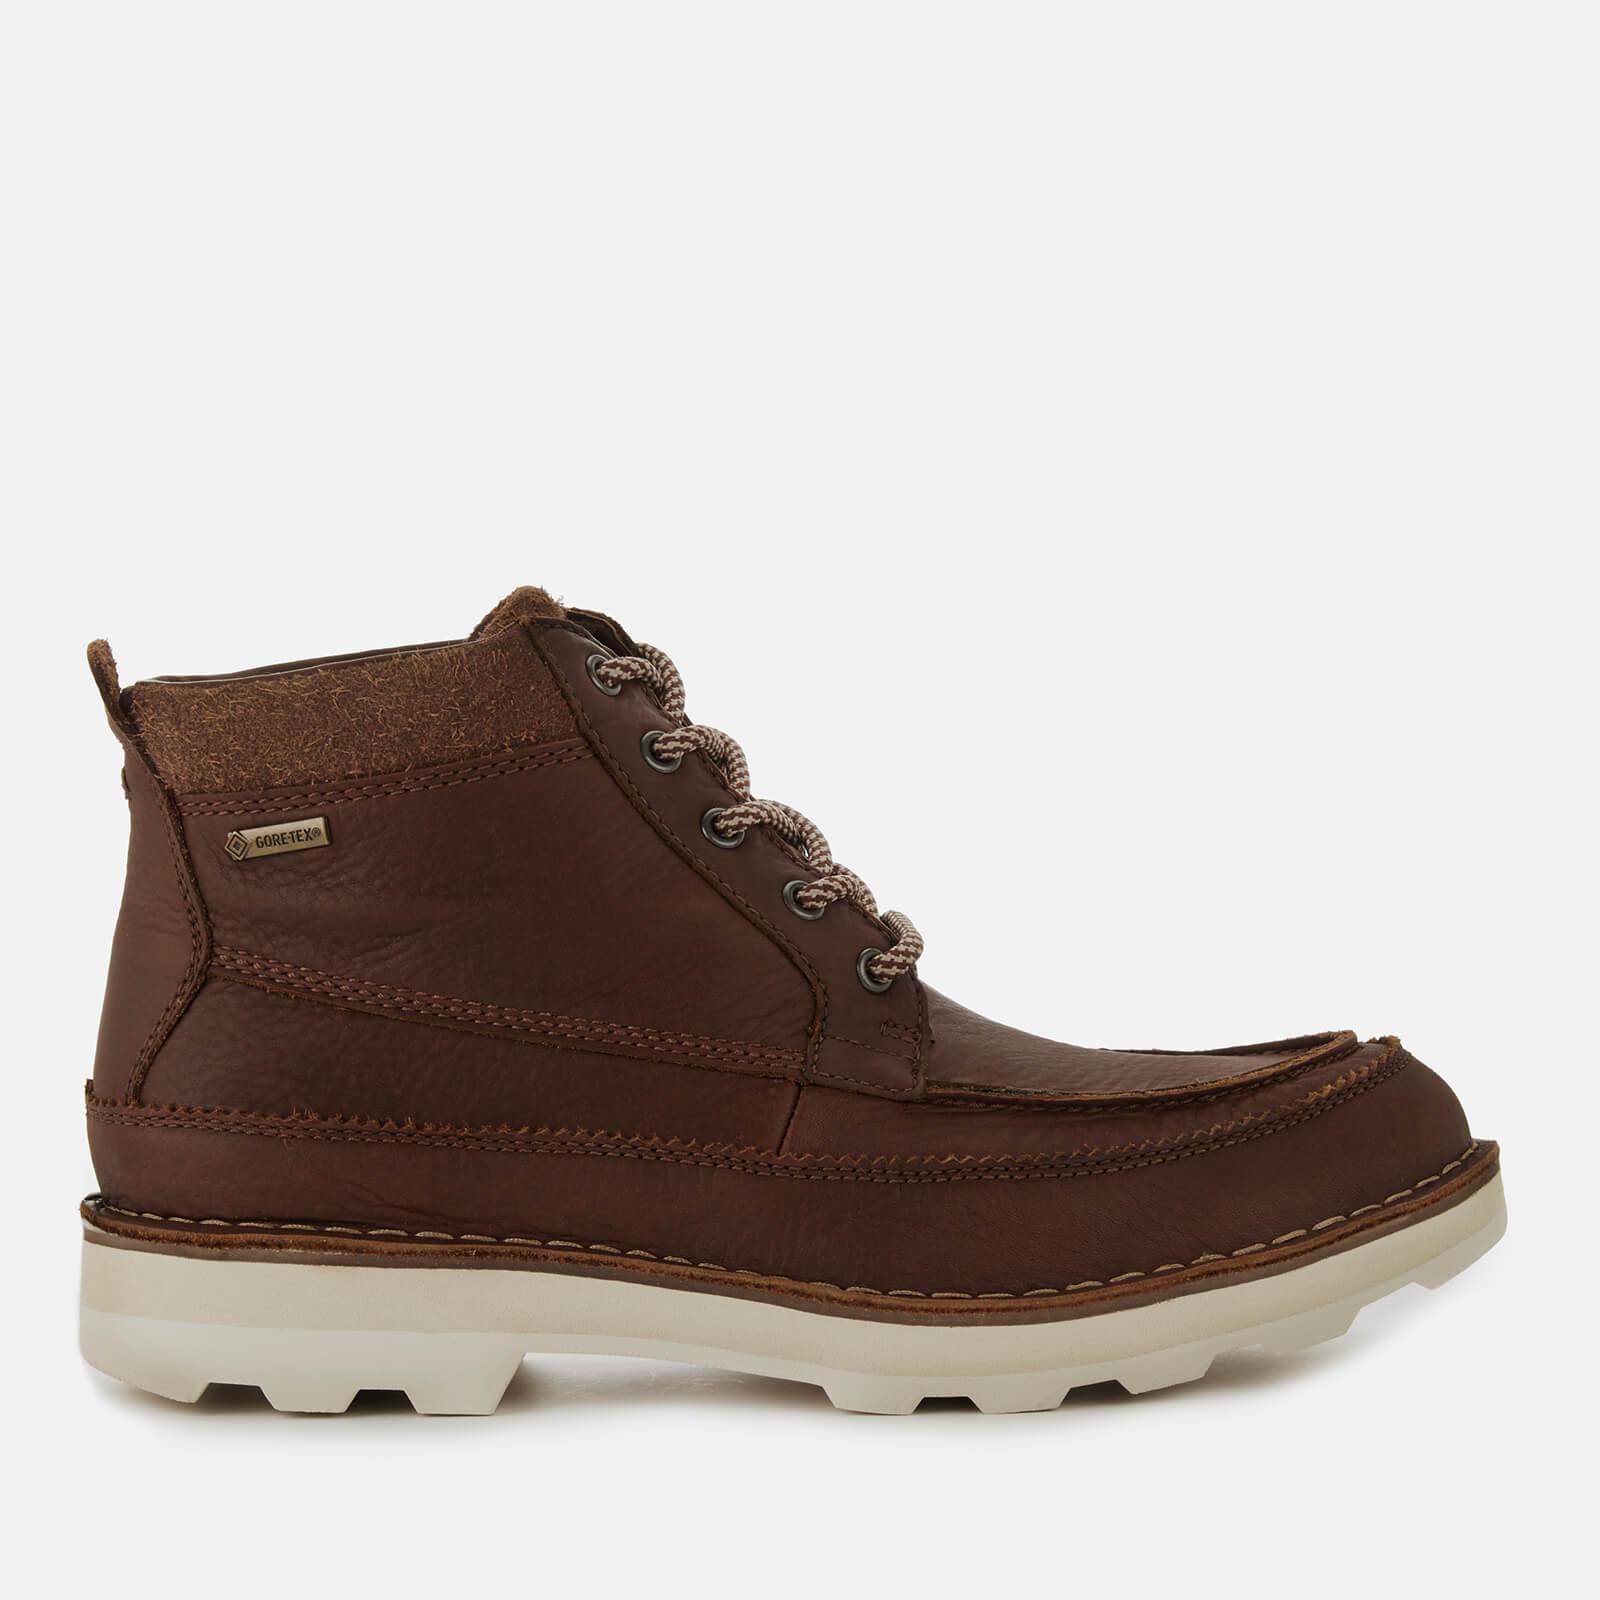 017d0fb3a5d Clarks Men's Korik Rise GORE-TEX Leather Lace Up Boots - British Tan Mens  Footwear | TheHut.com